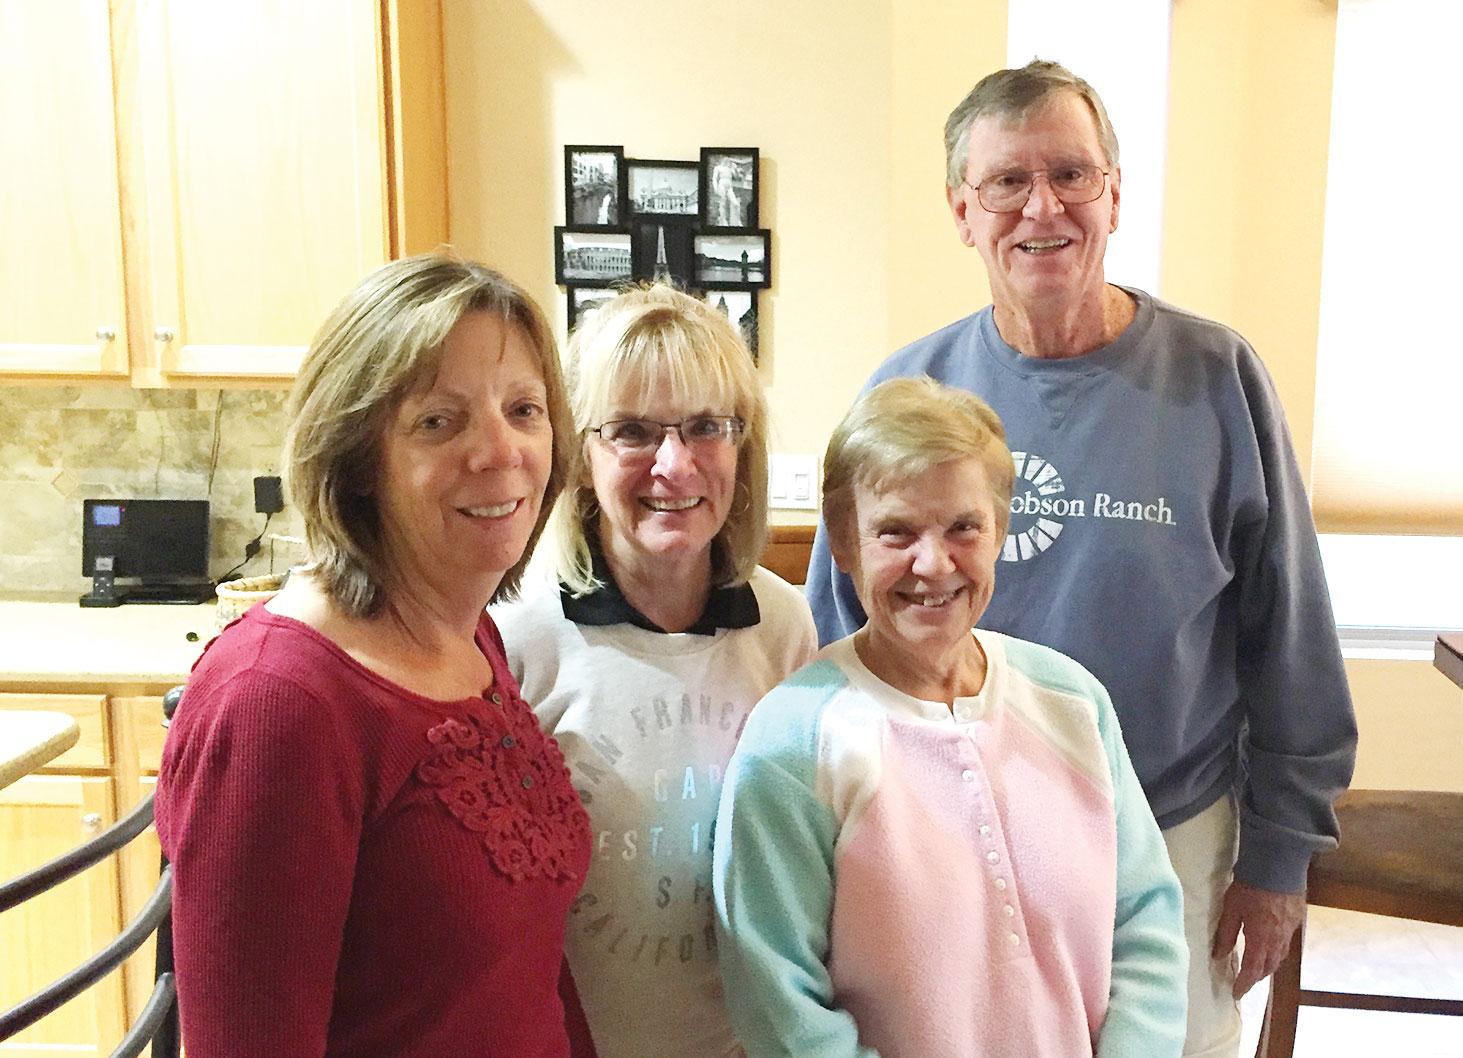 Tennis Club 2017 Executive Board: Barbara Sewell, Linda Gayer, CJ Azaria and Bill Christofferson; missing was Tom Harris